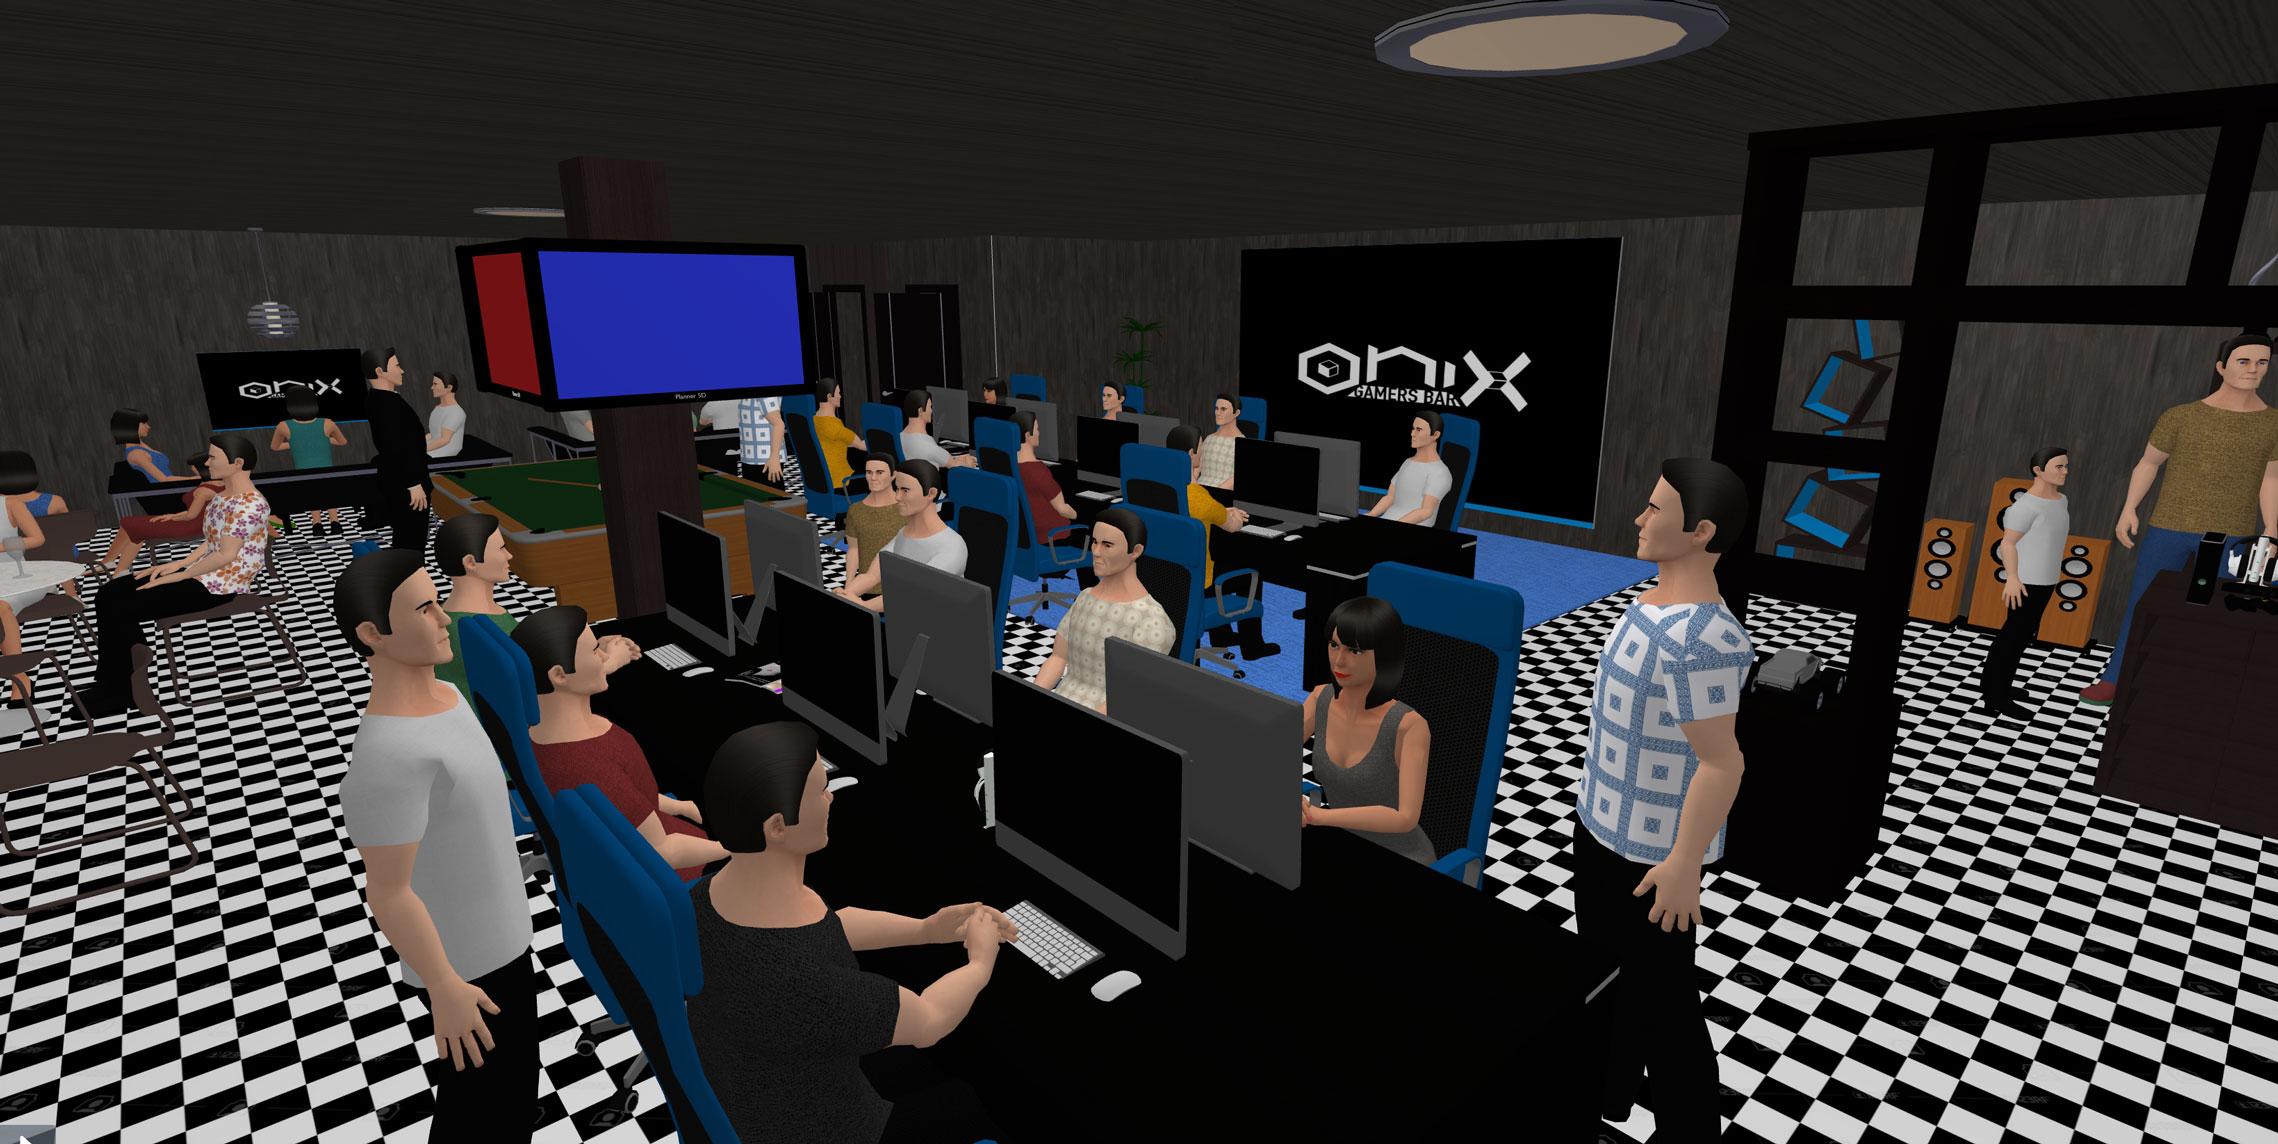 interior_3D_onix2.jpg